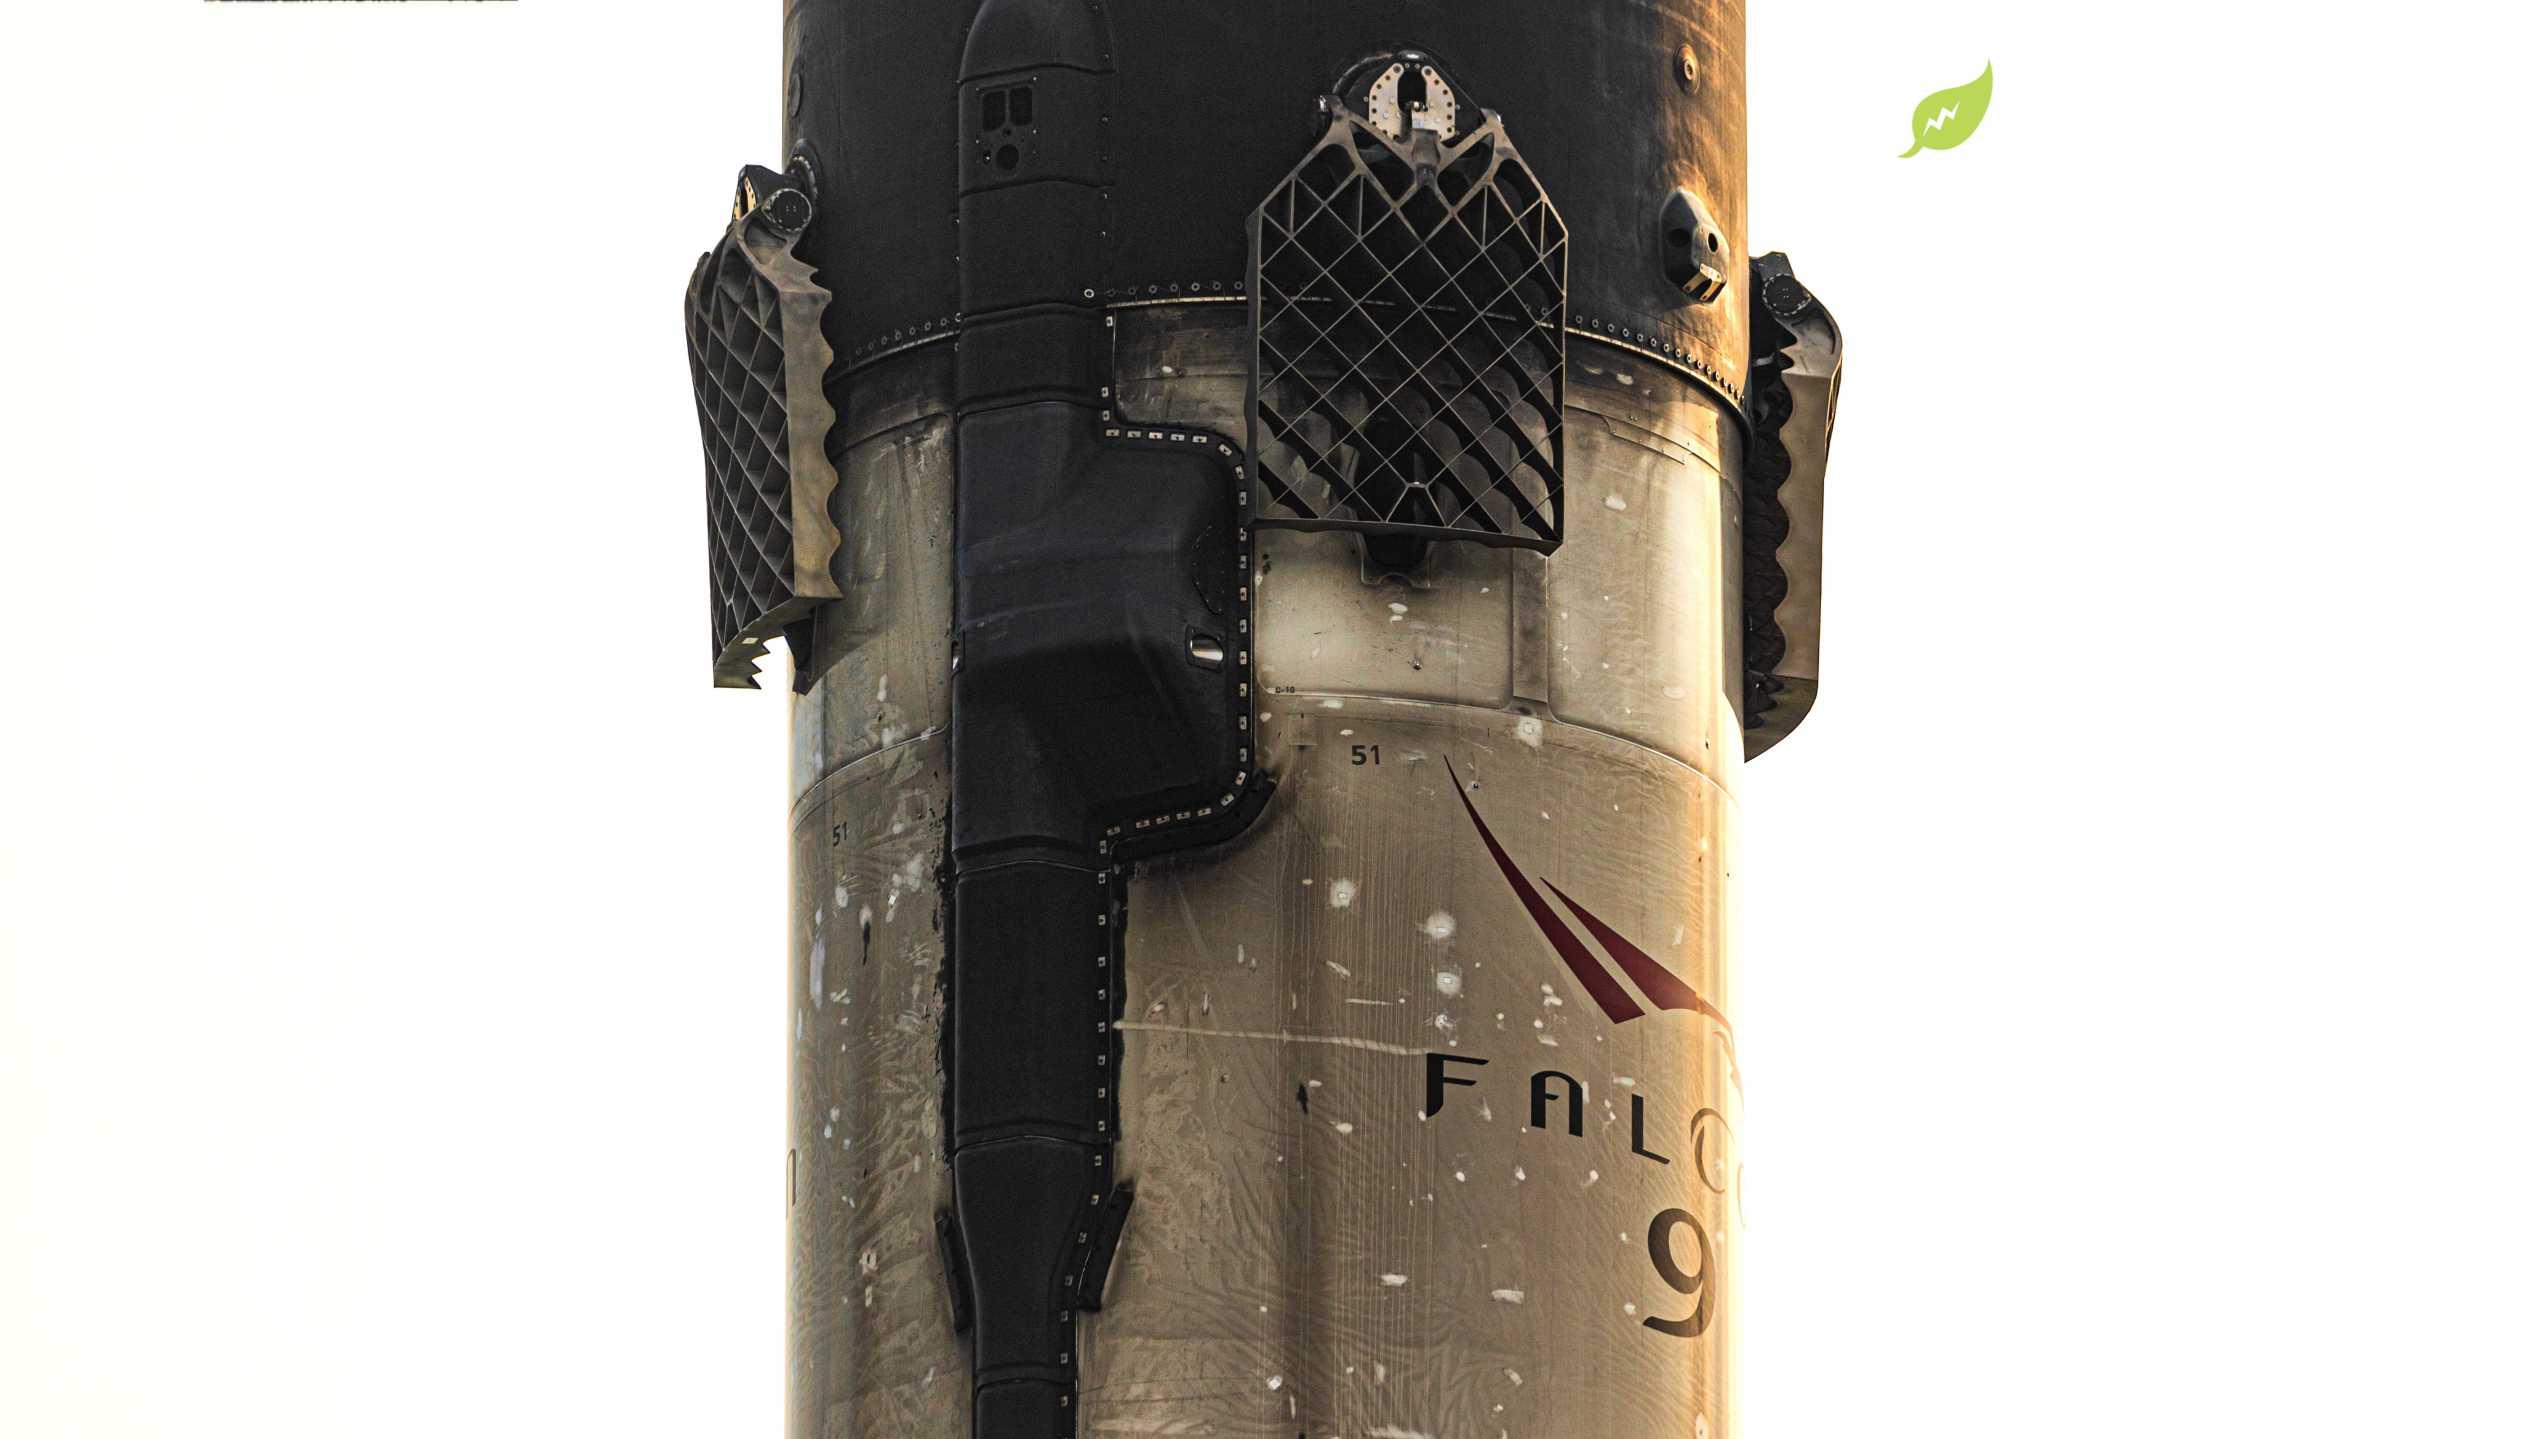 Starlink-6 Falcon 9 B1051 OCISLY 042520 (Richard Angle) return (13) crop (c)